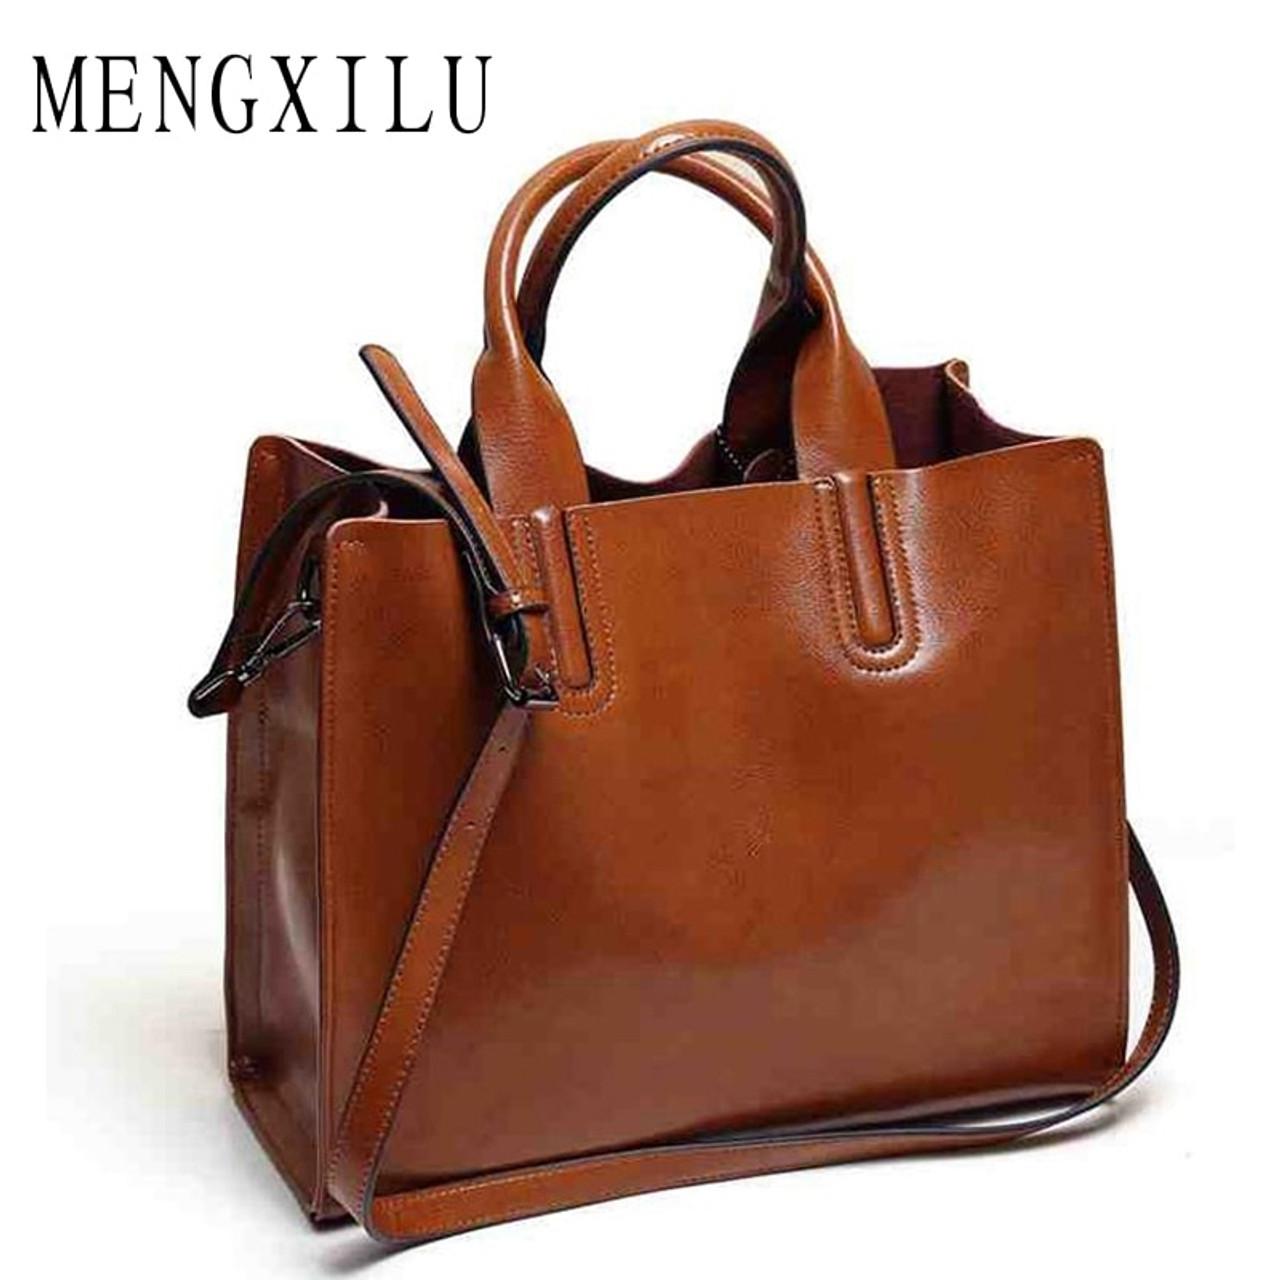 Leather Bags Handbags Women Famous Brands Big Casual Women Bags Trunk Tote  Spanish Brand Shoulder Bag Ladies large Bolsos Mujer - OnshopDeals.Com d9837d3e4c08e